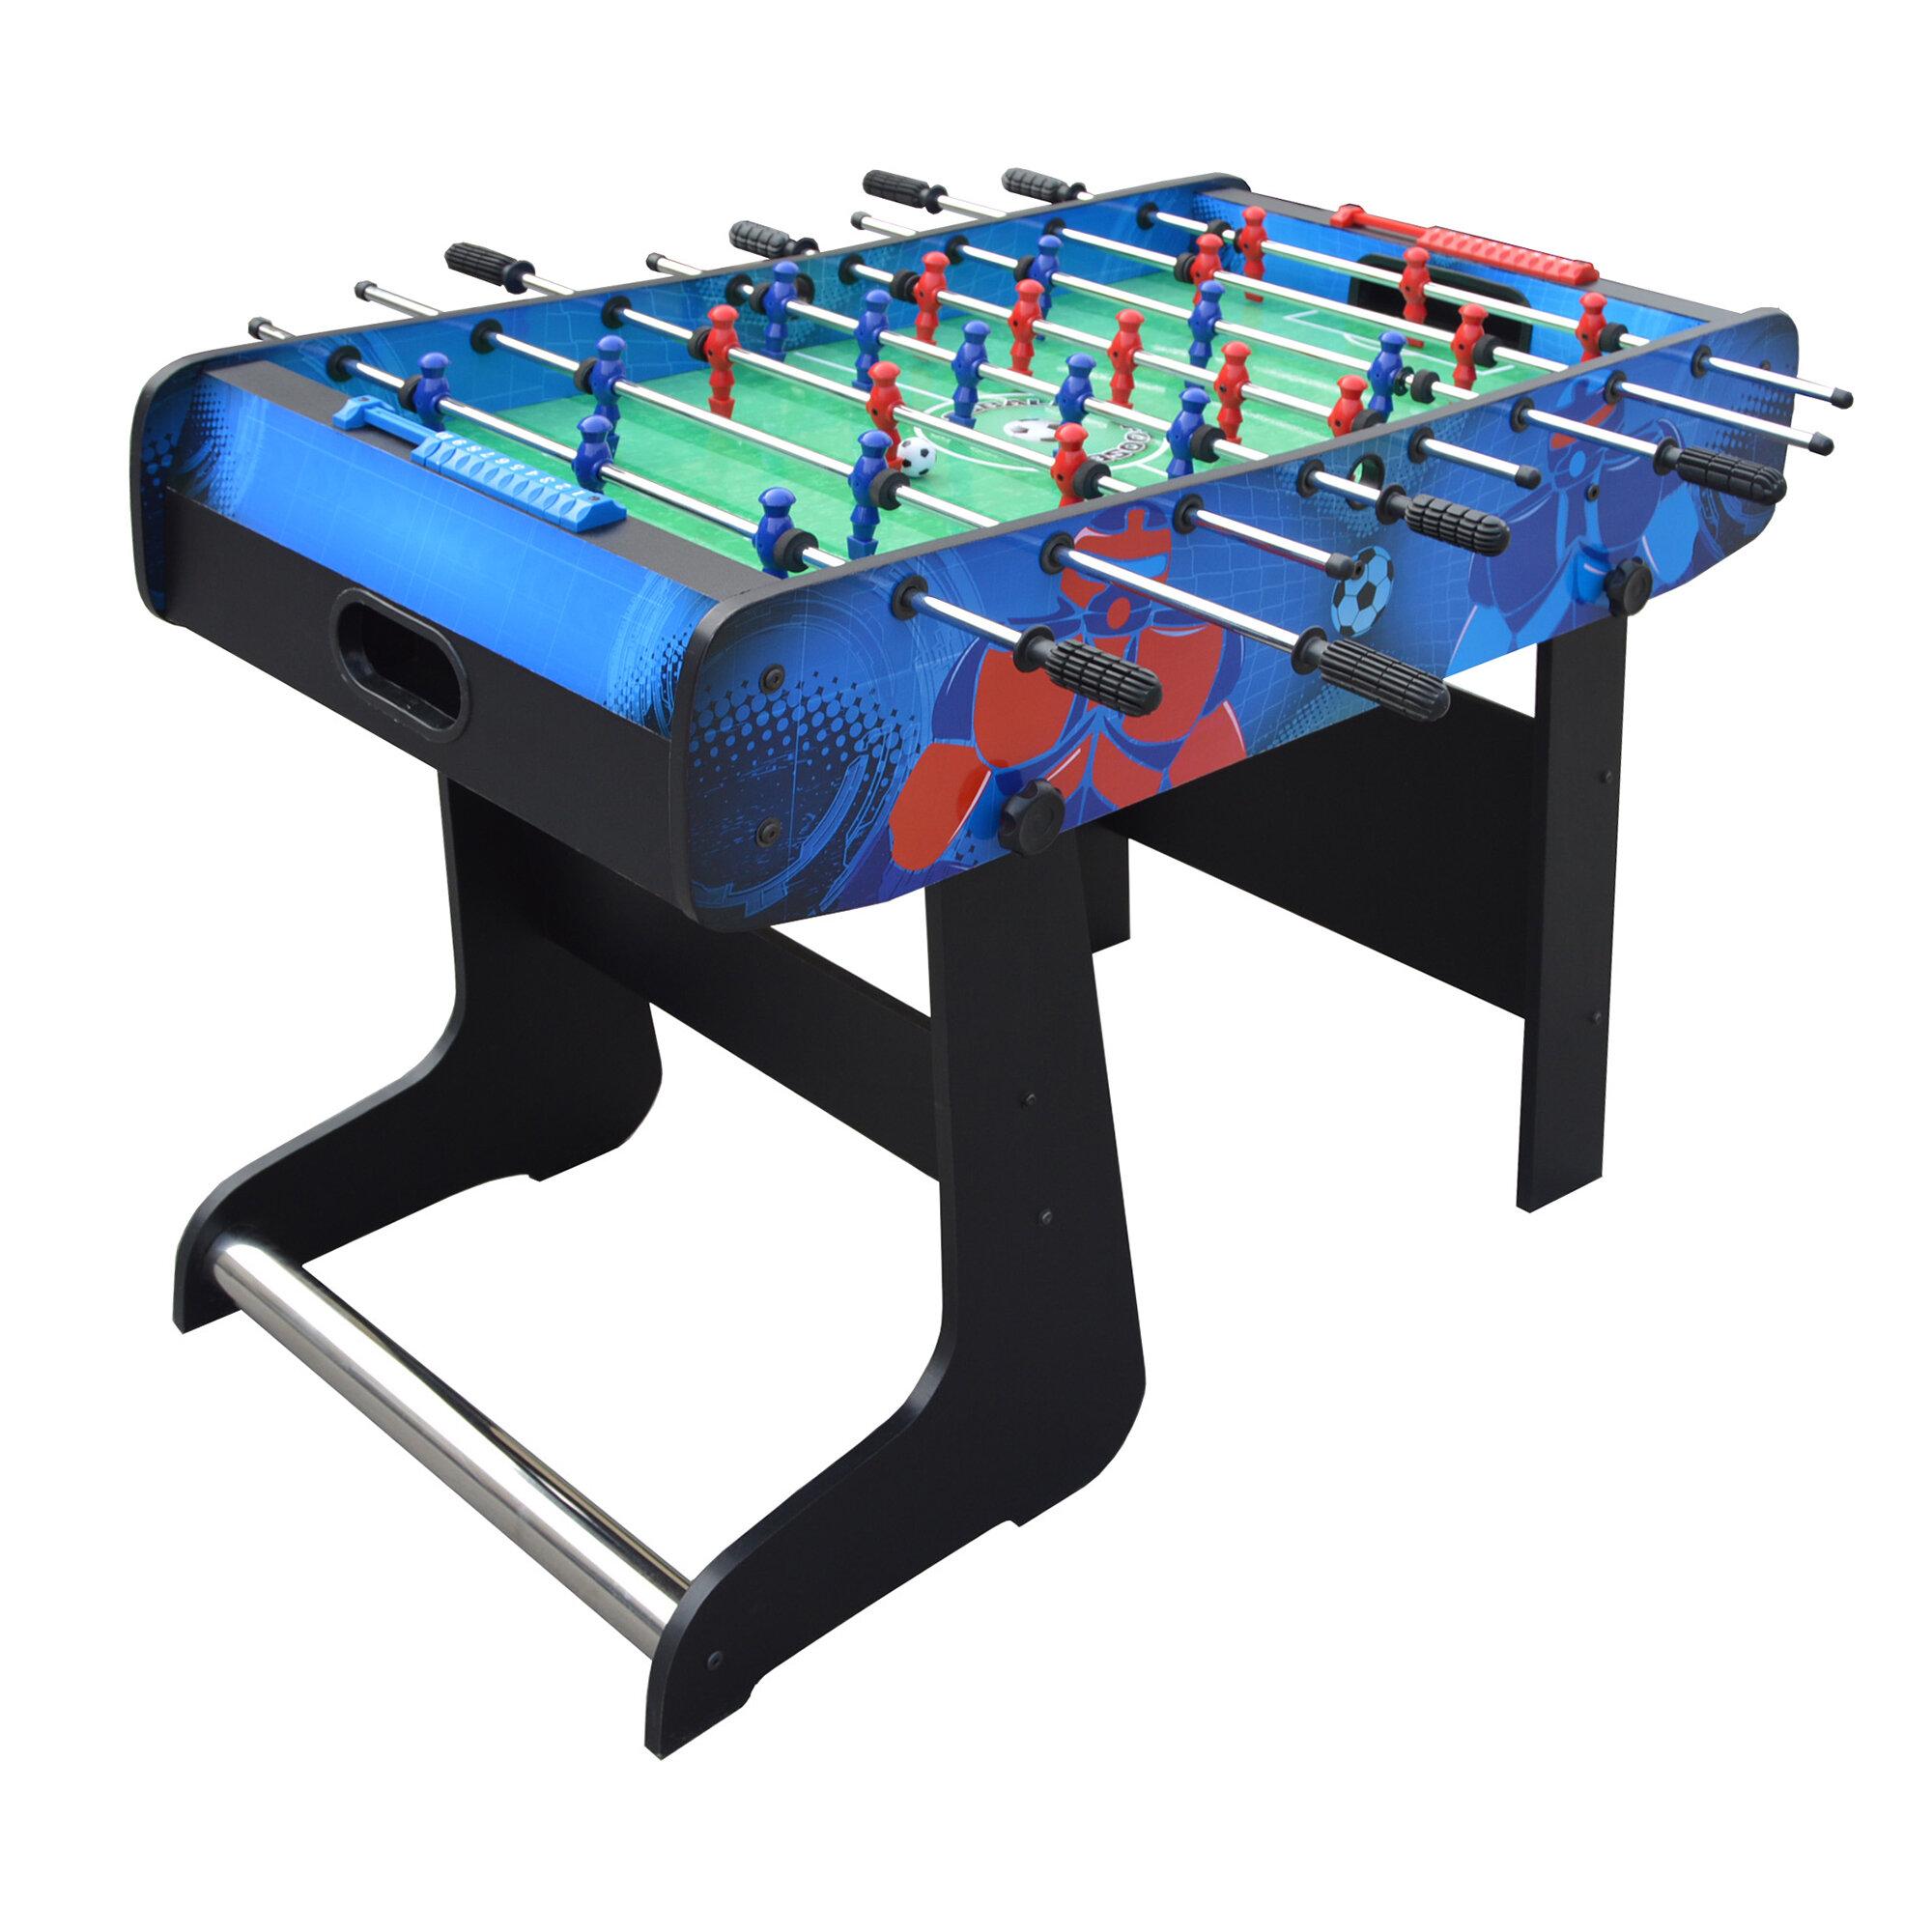 Hathaway Games Gladiator Folding Foosball Table Reviews Wayfair - Foosball table houston